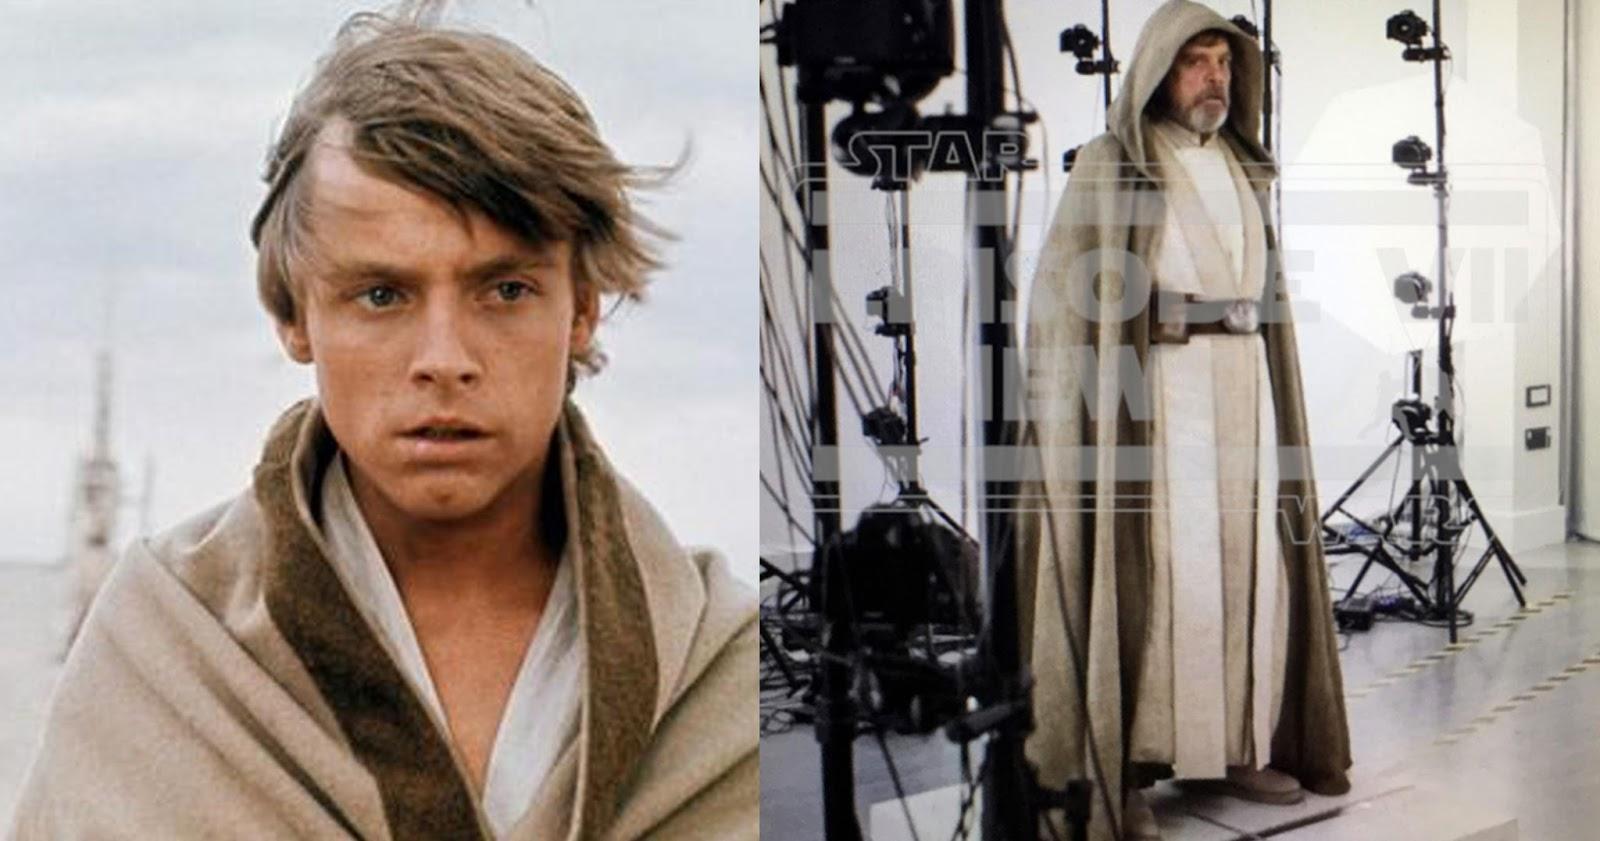 THE FINE ART DINER: First Look At Luke Skywalker's Costume ...